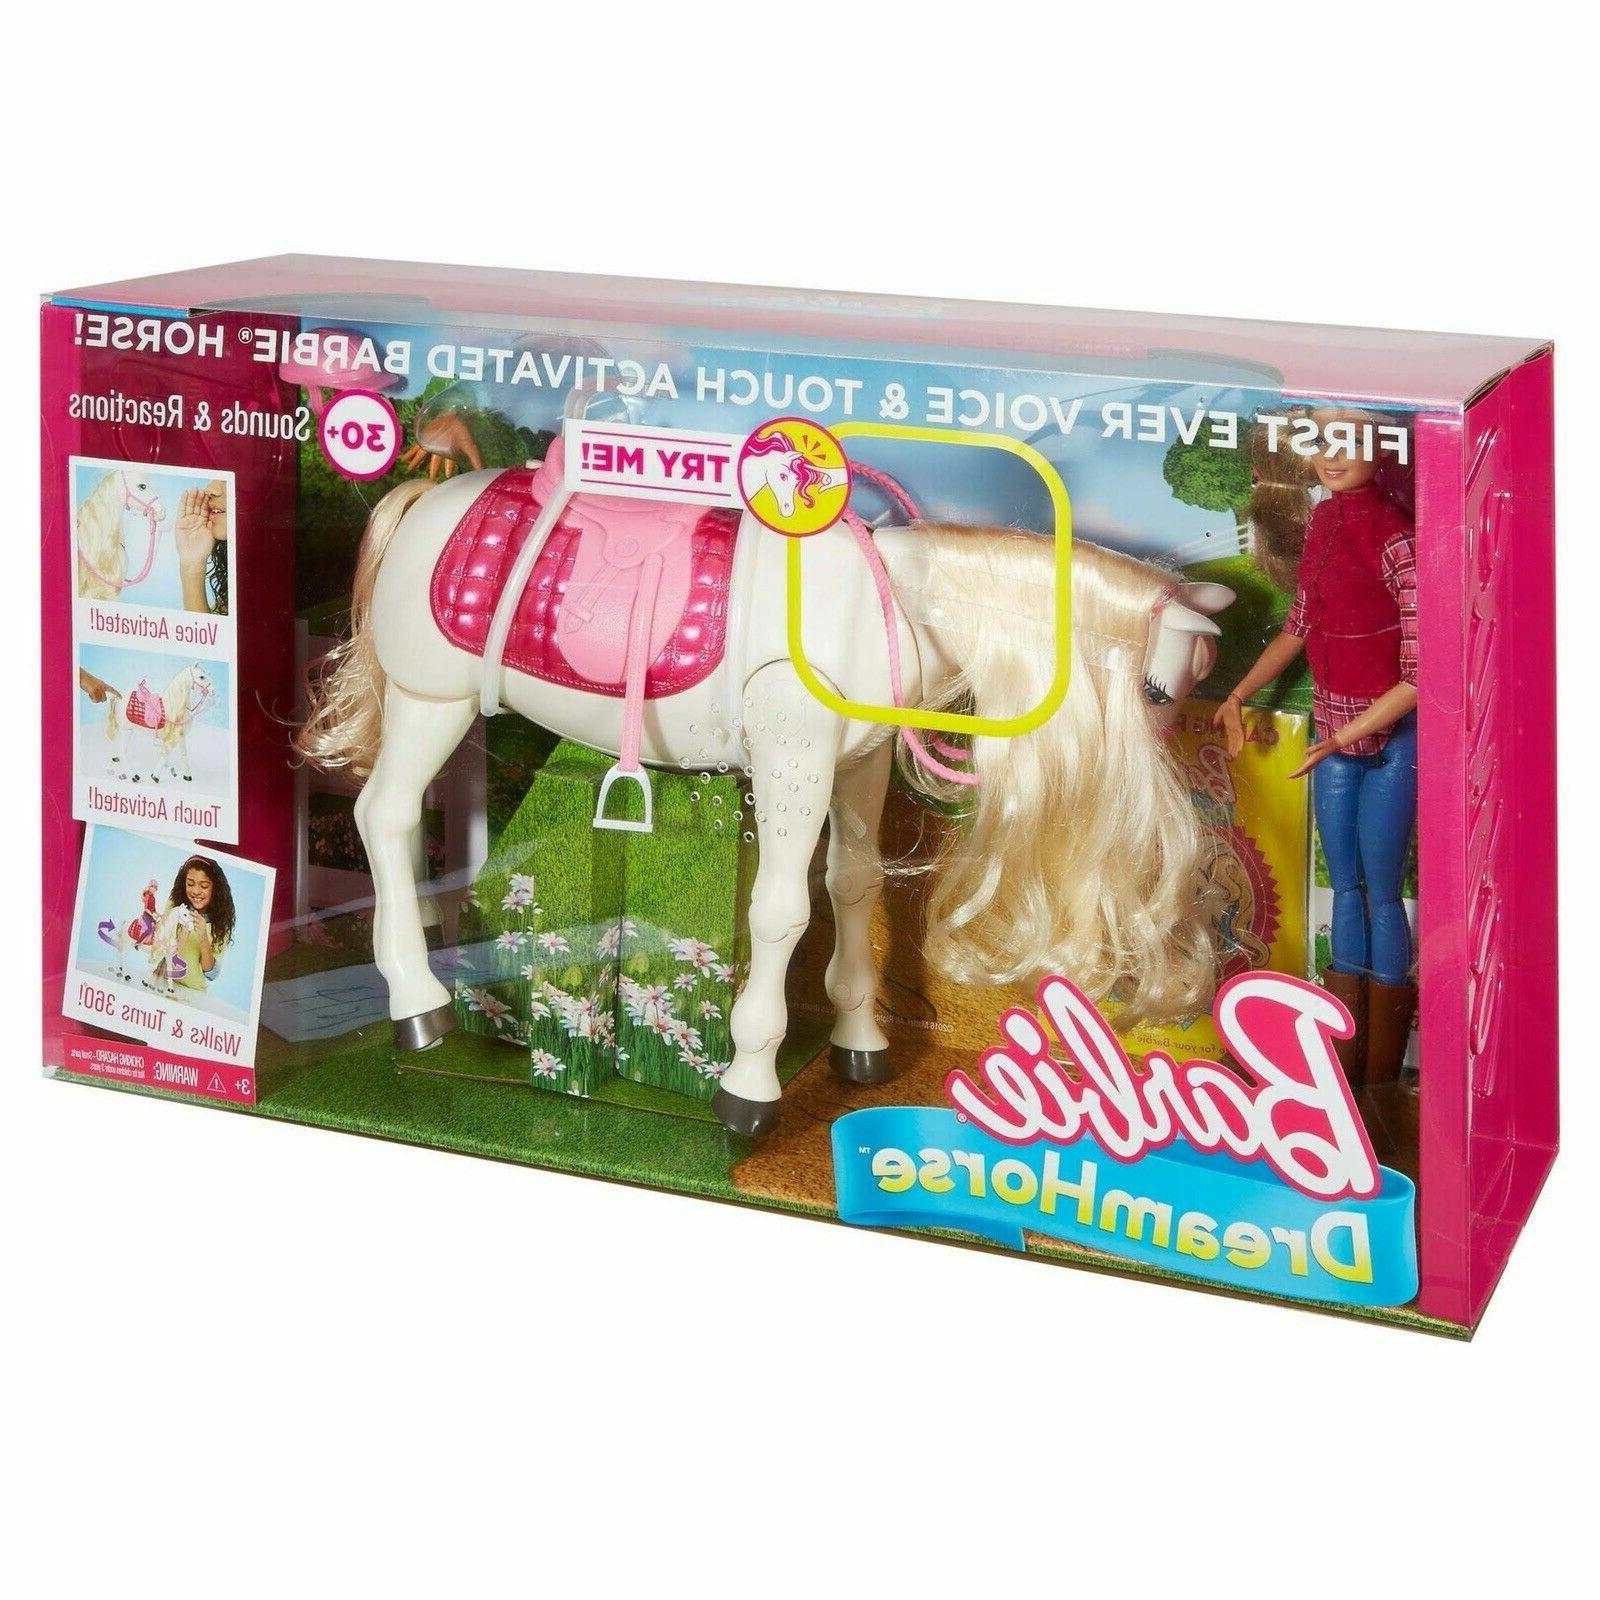 dream horse blonde doll